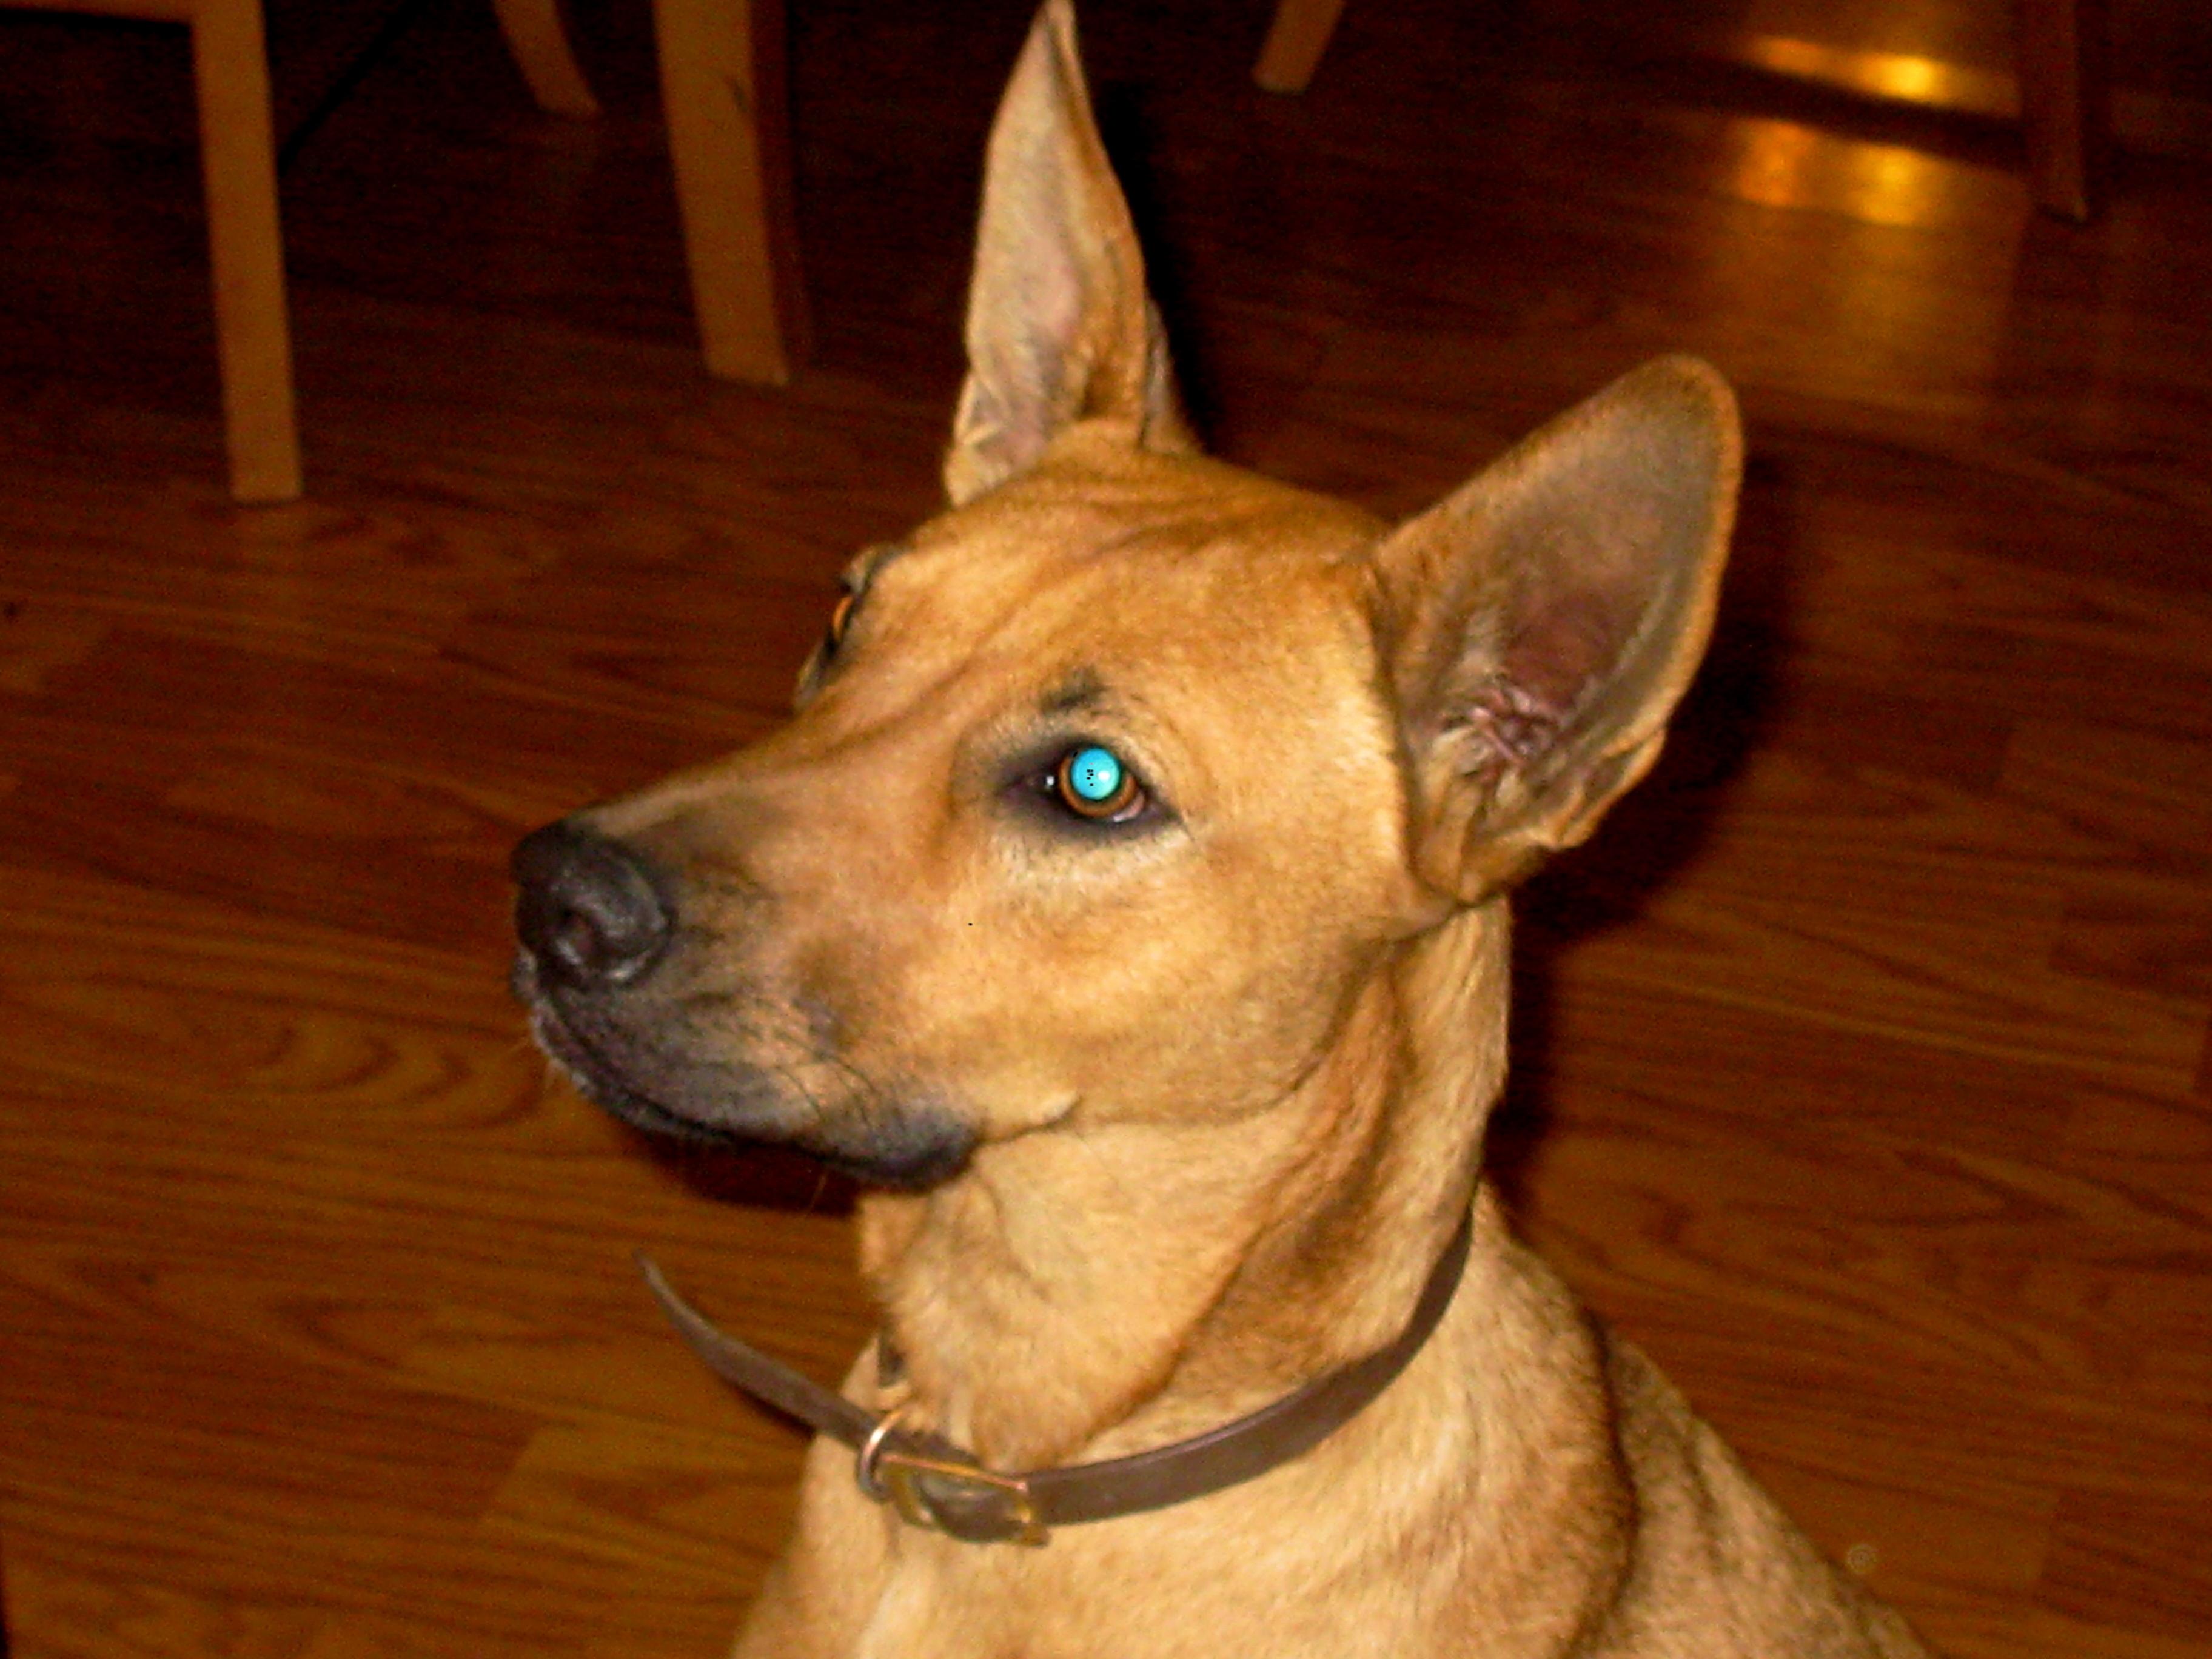 Lulu the wonder dog